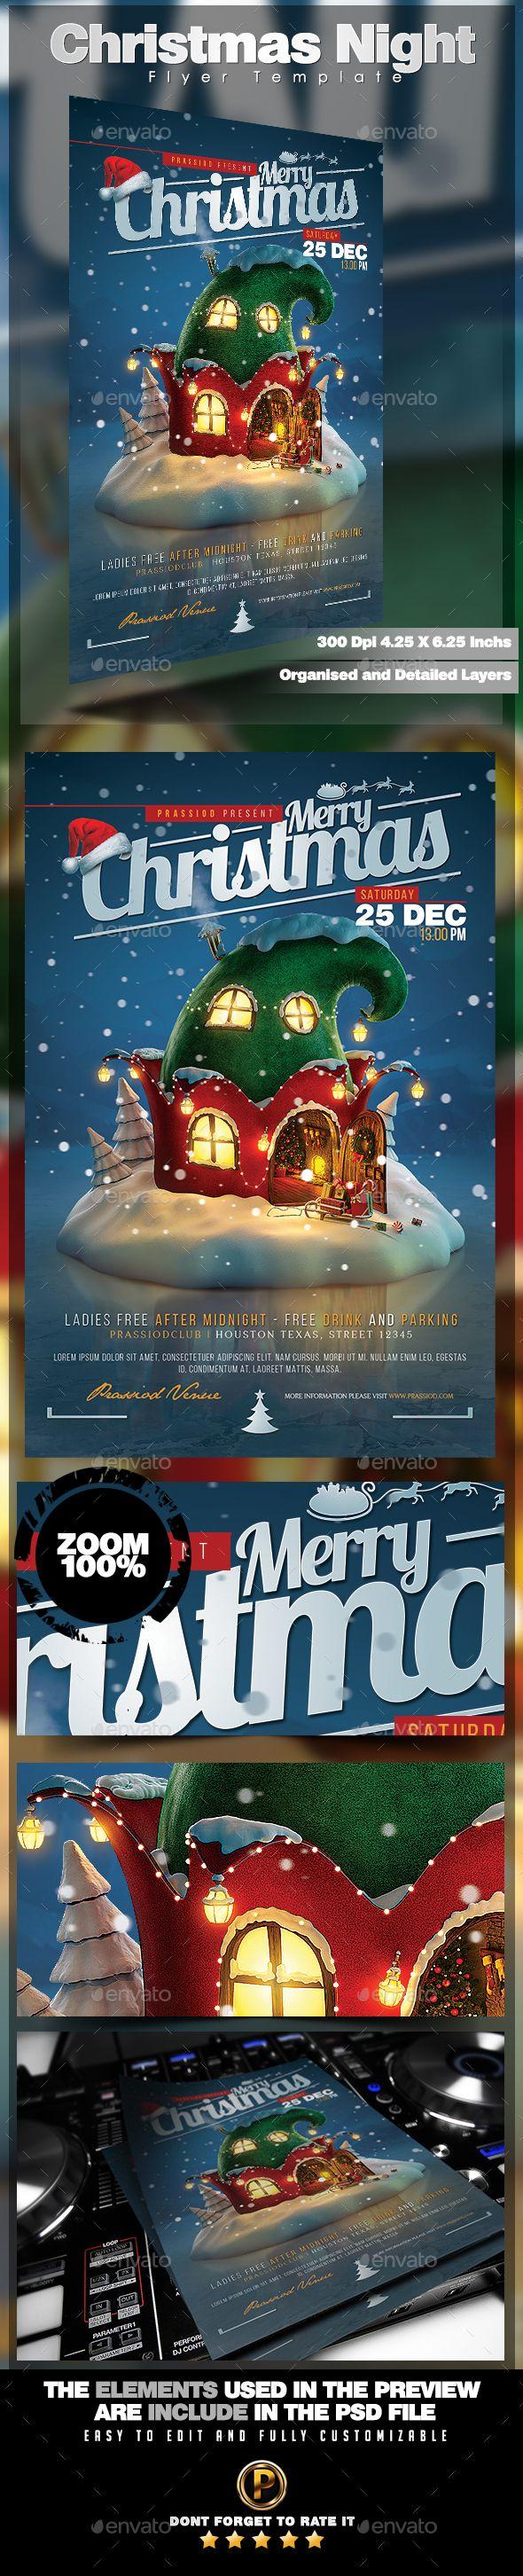 Christmas Night Flyer Template PSD #design #xmas Download: http://graphicriver.net/item/christmas-night-flyer-template/13446690?ref=ksioks